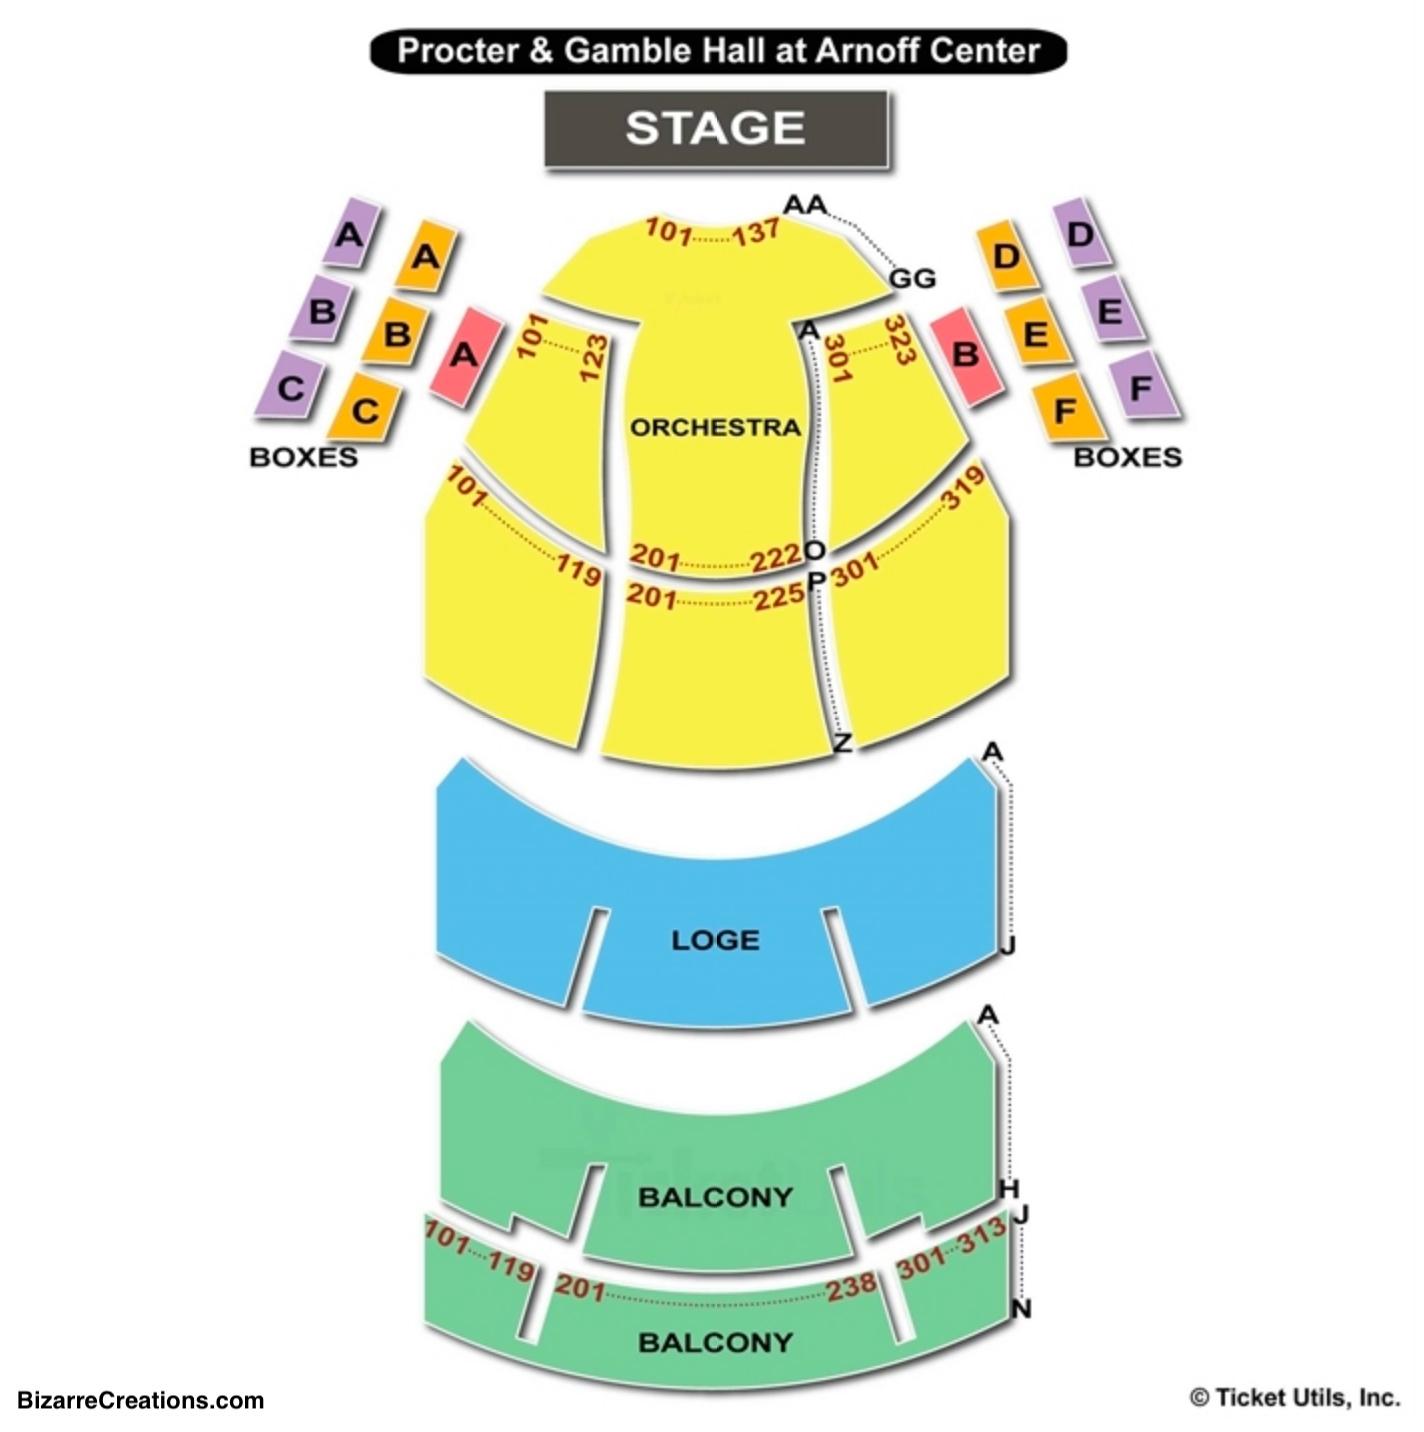 Aronoff Center Seating Chart